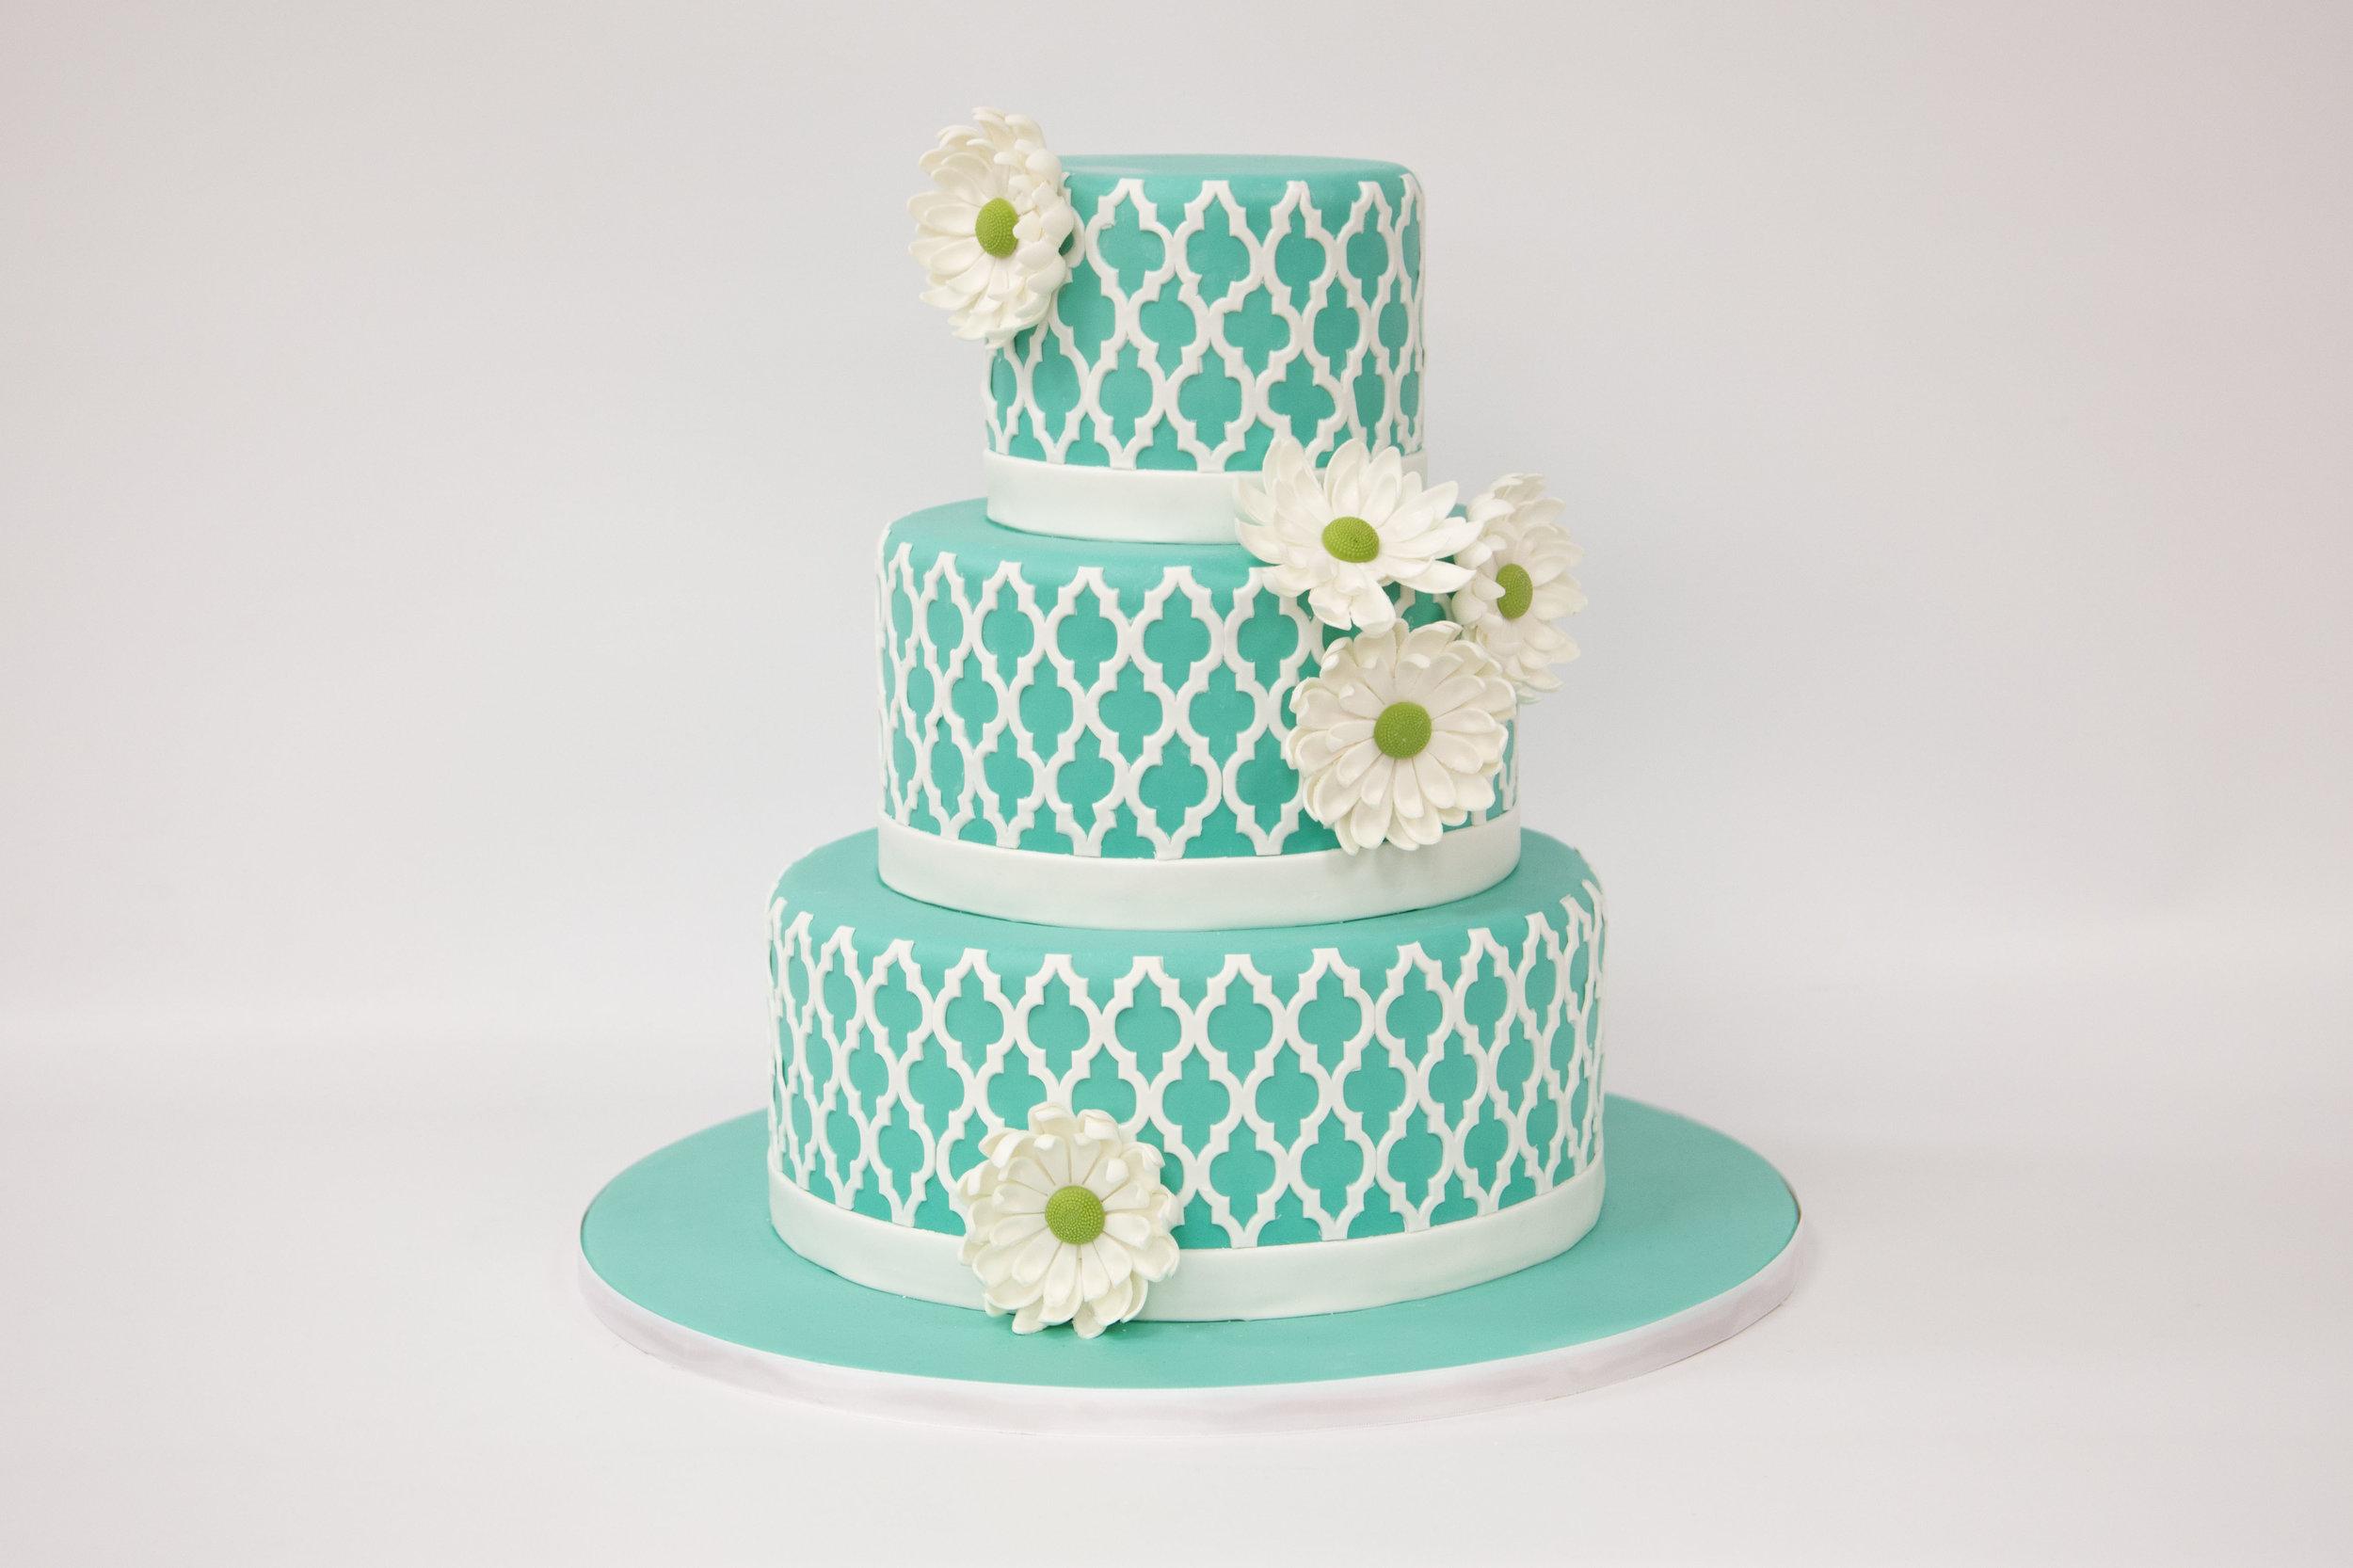 cake-4 copy.jpg